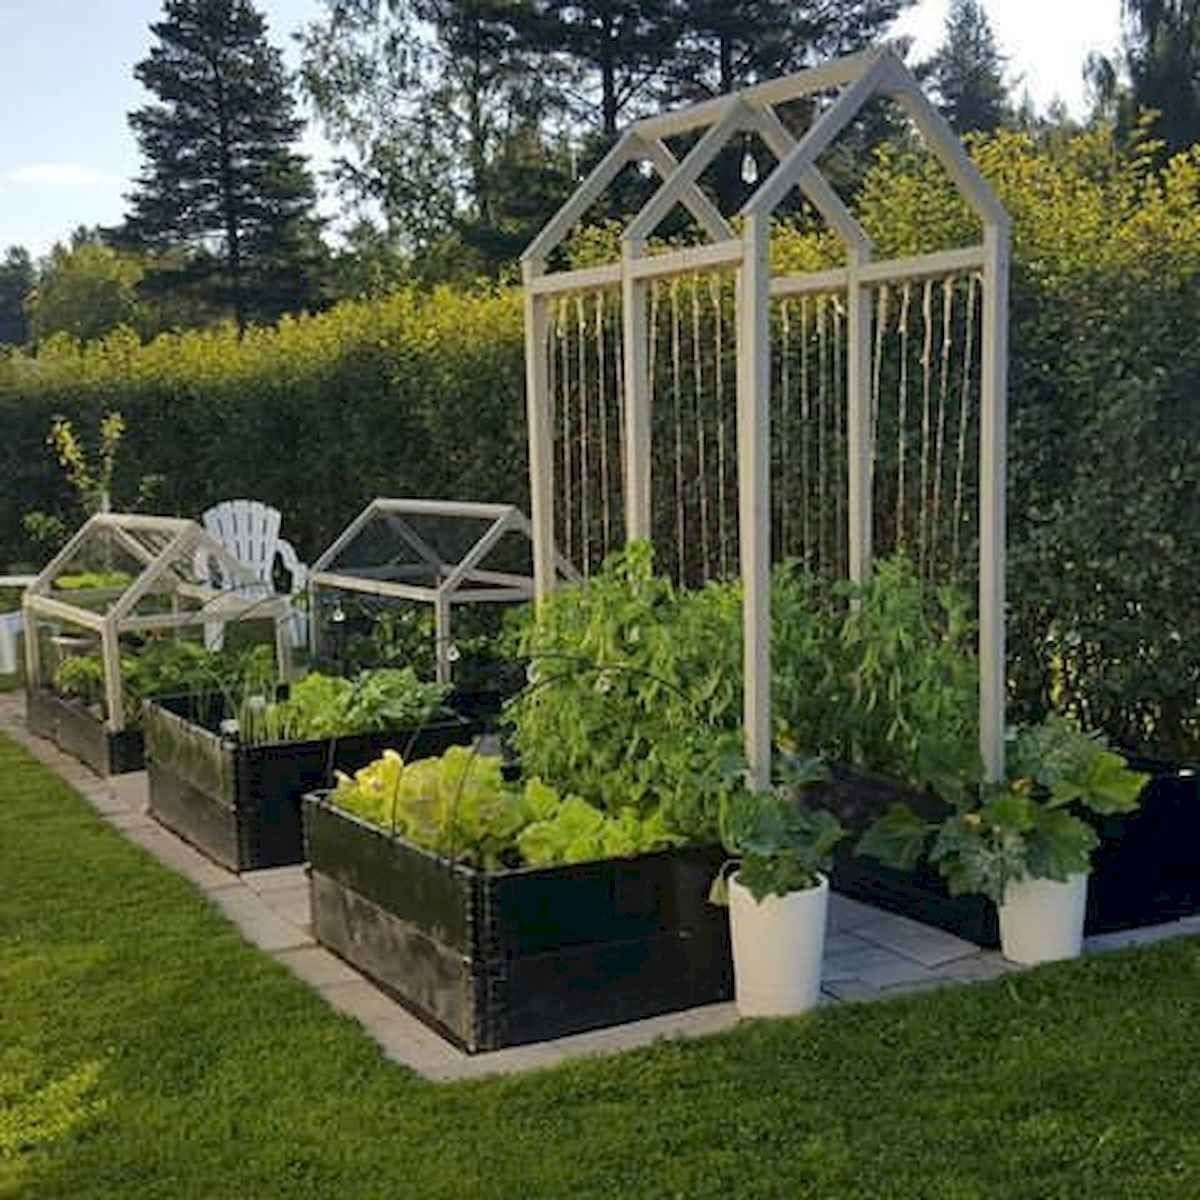 Rustic Vegetable Garden Design Ideas For Your Backyard Inspiration 18